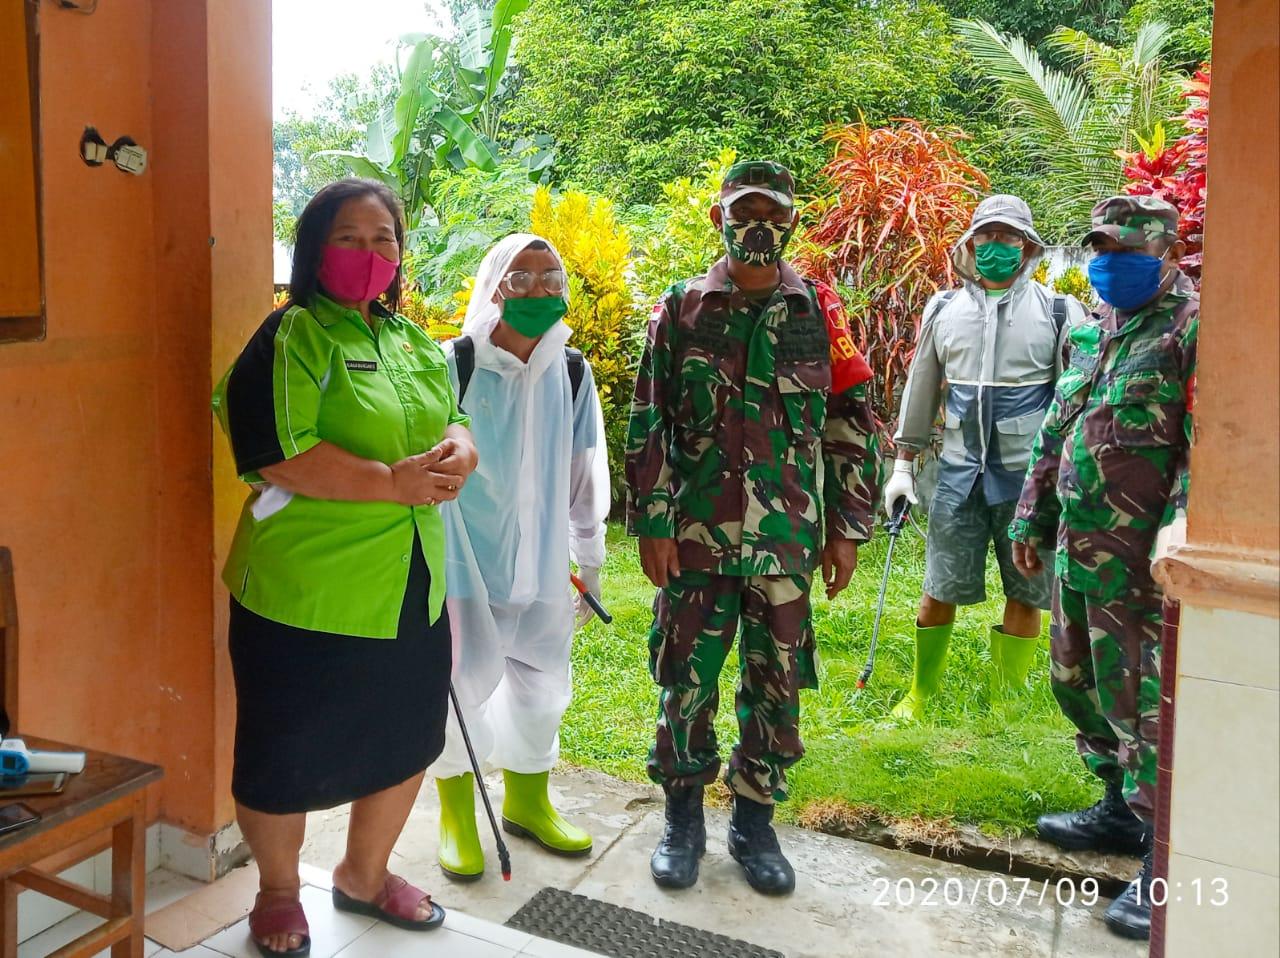 Babinsa bersama perangkat serta relawan covid-19 desa kiama maredaren semprot fasum dengan disinfektan